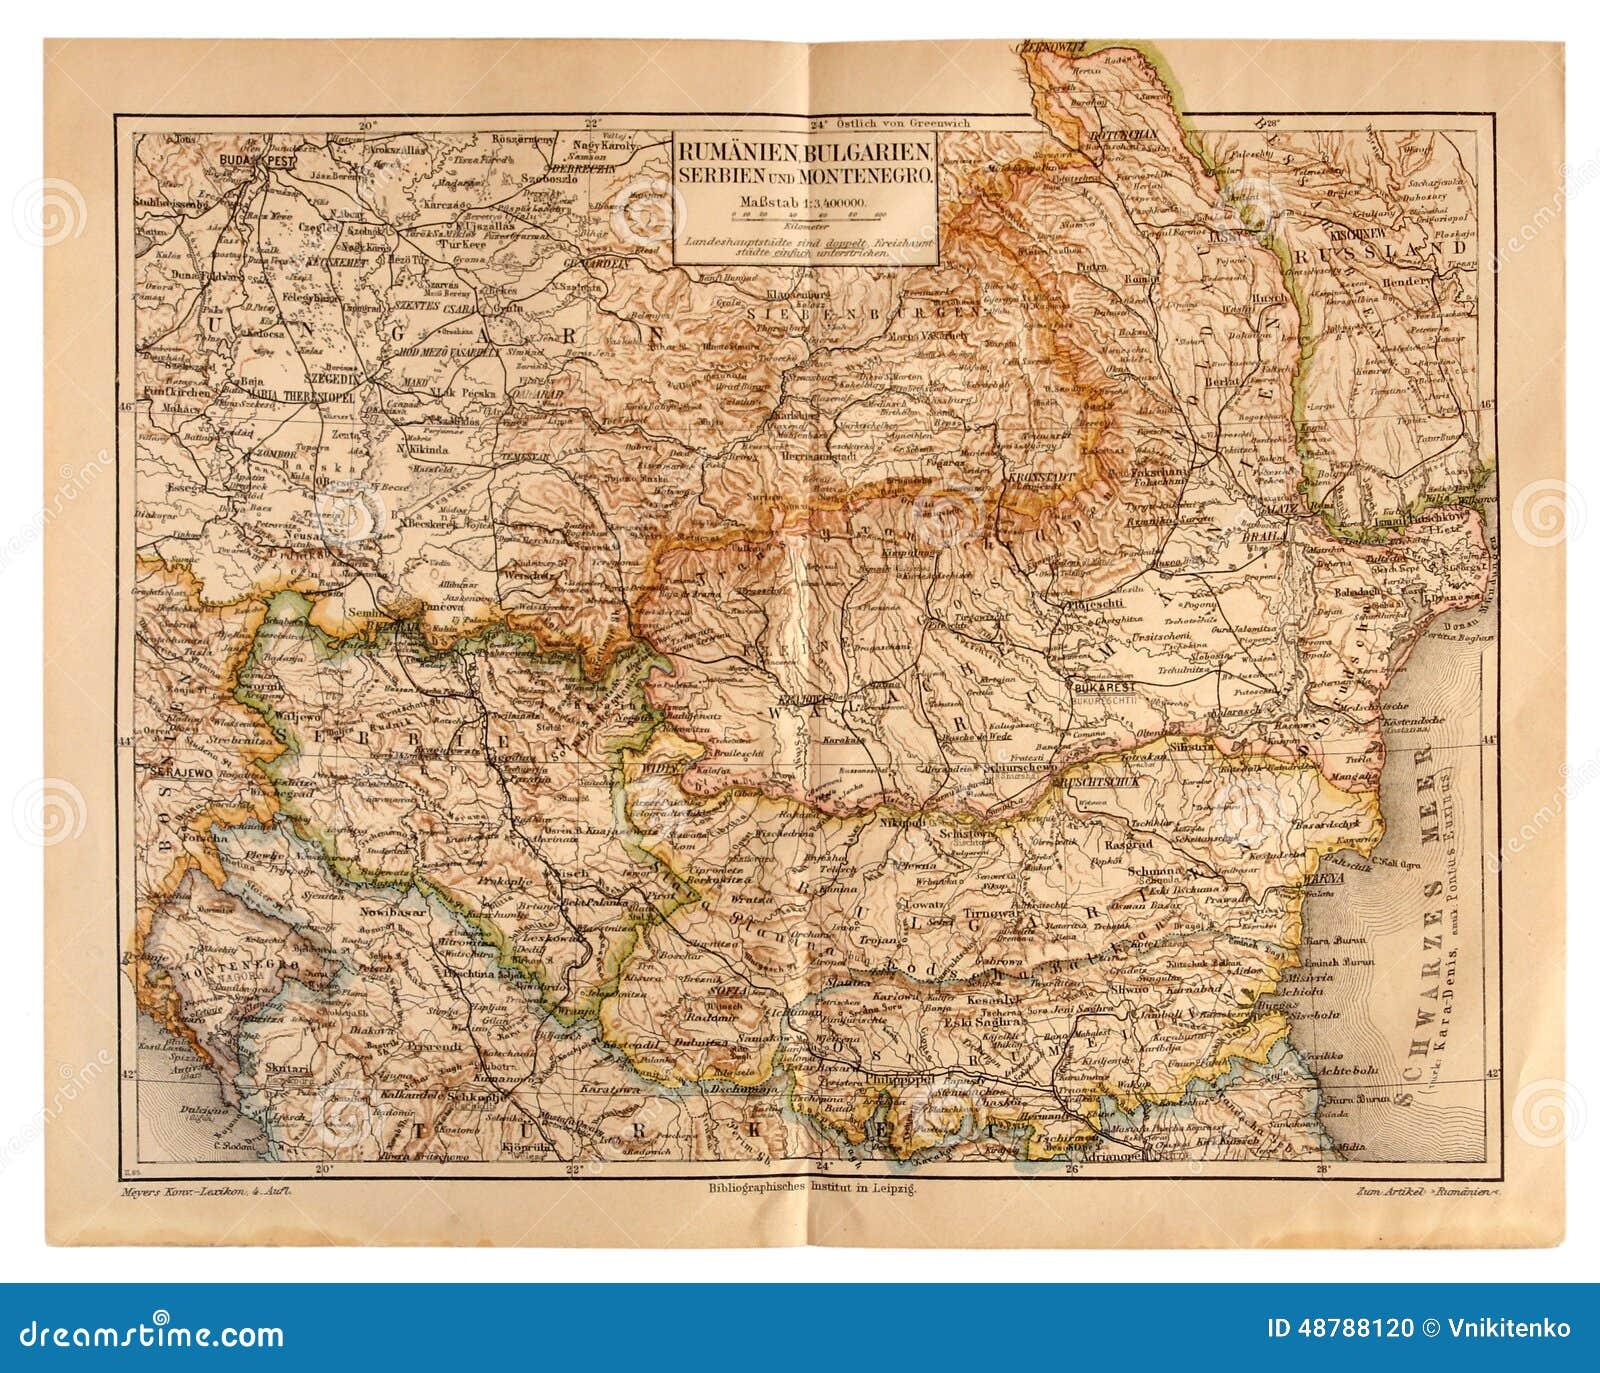 Carte Roumanie Bulgarie.Vieille Carte De La Roumanie Bulgarie Serbie Et Montenegro